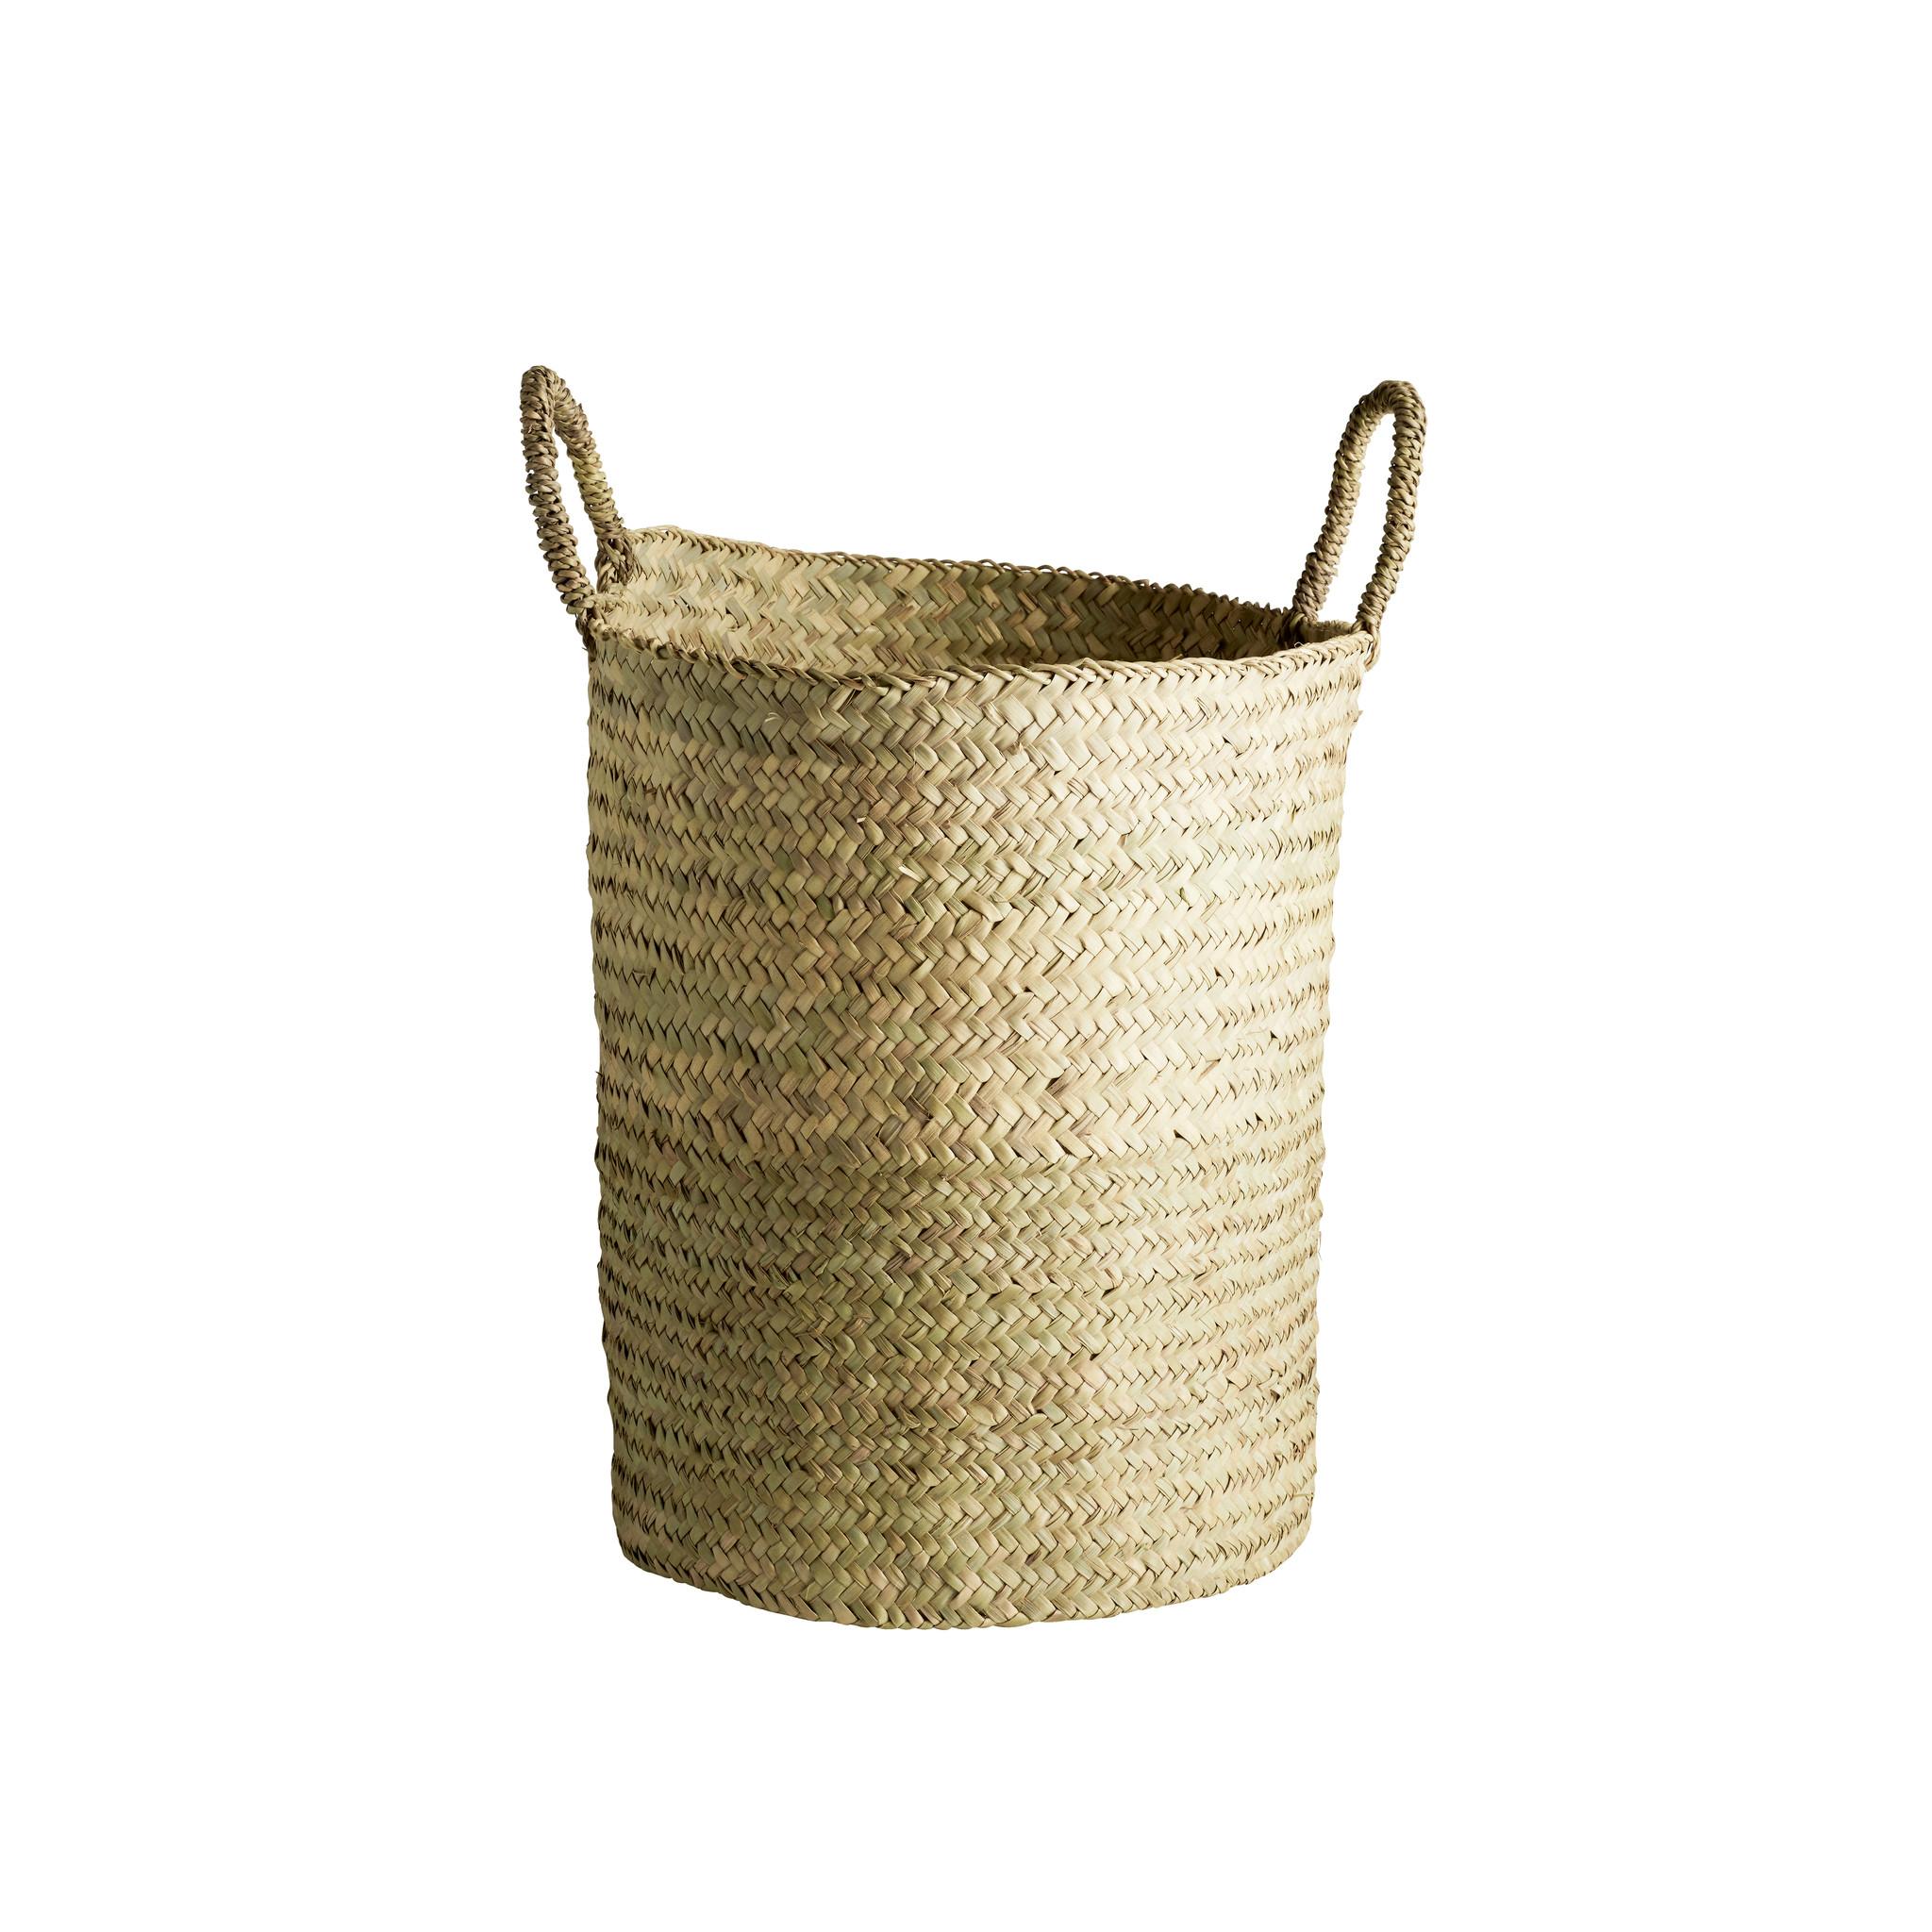 TineKHome Laundry basket palm leaves - Ø40Xh43cm - TinekHome